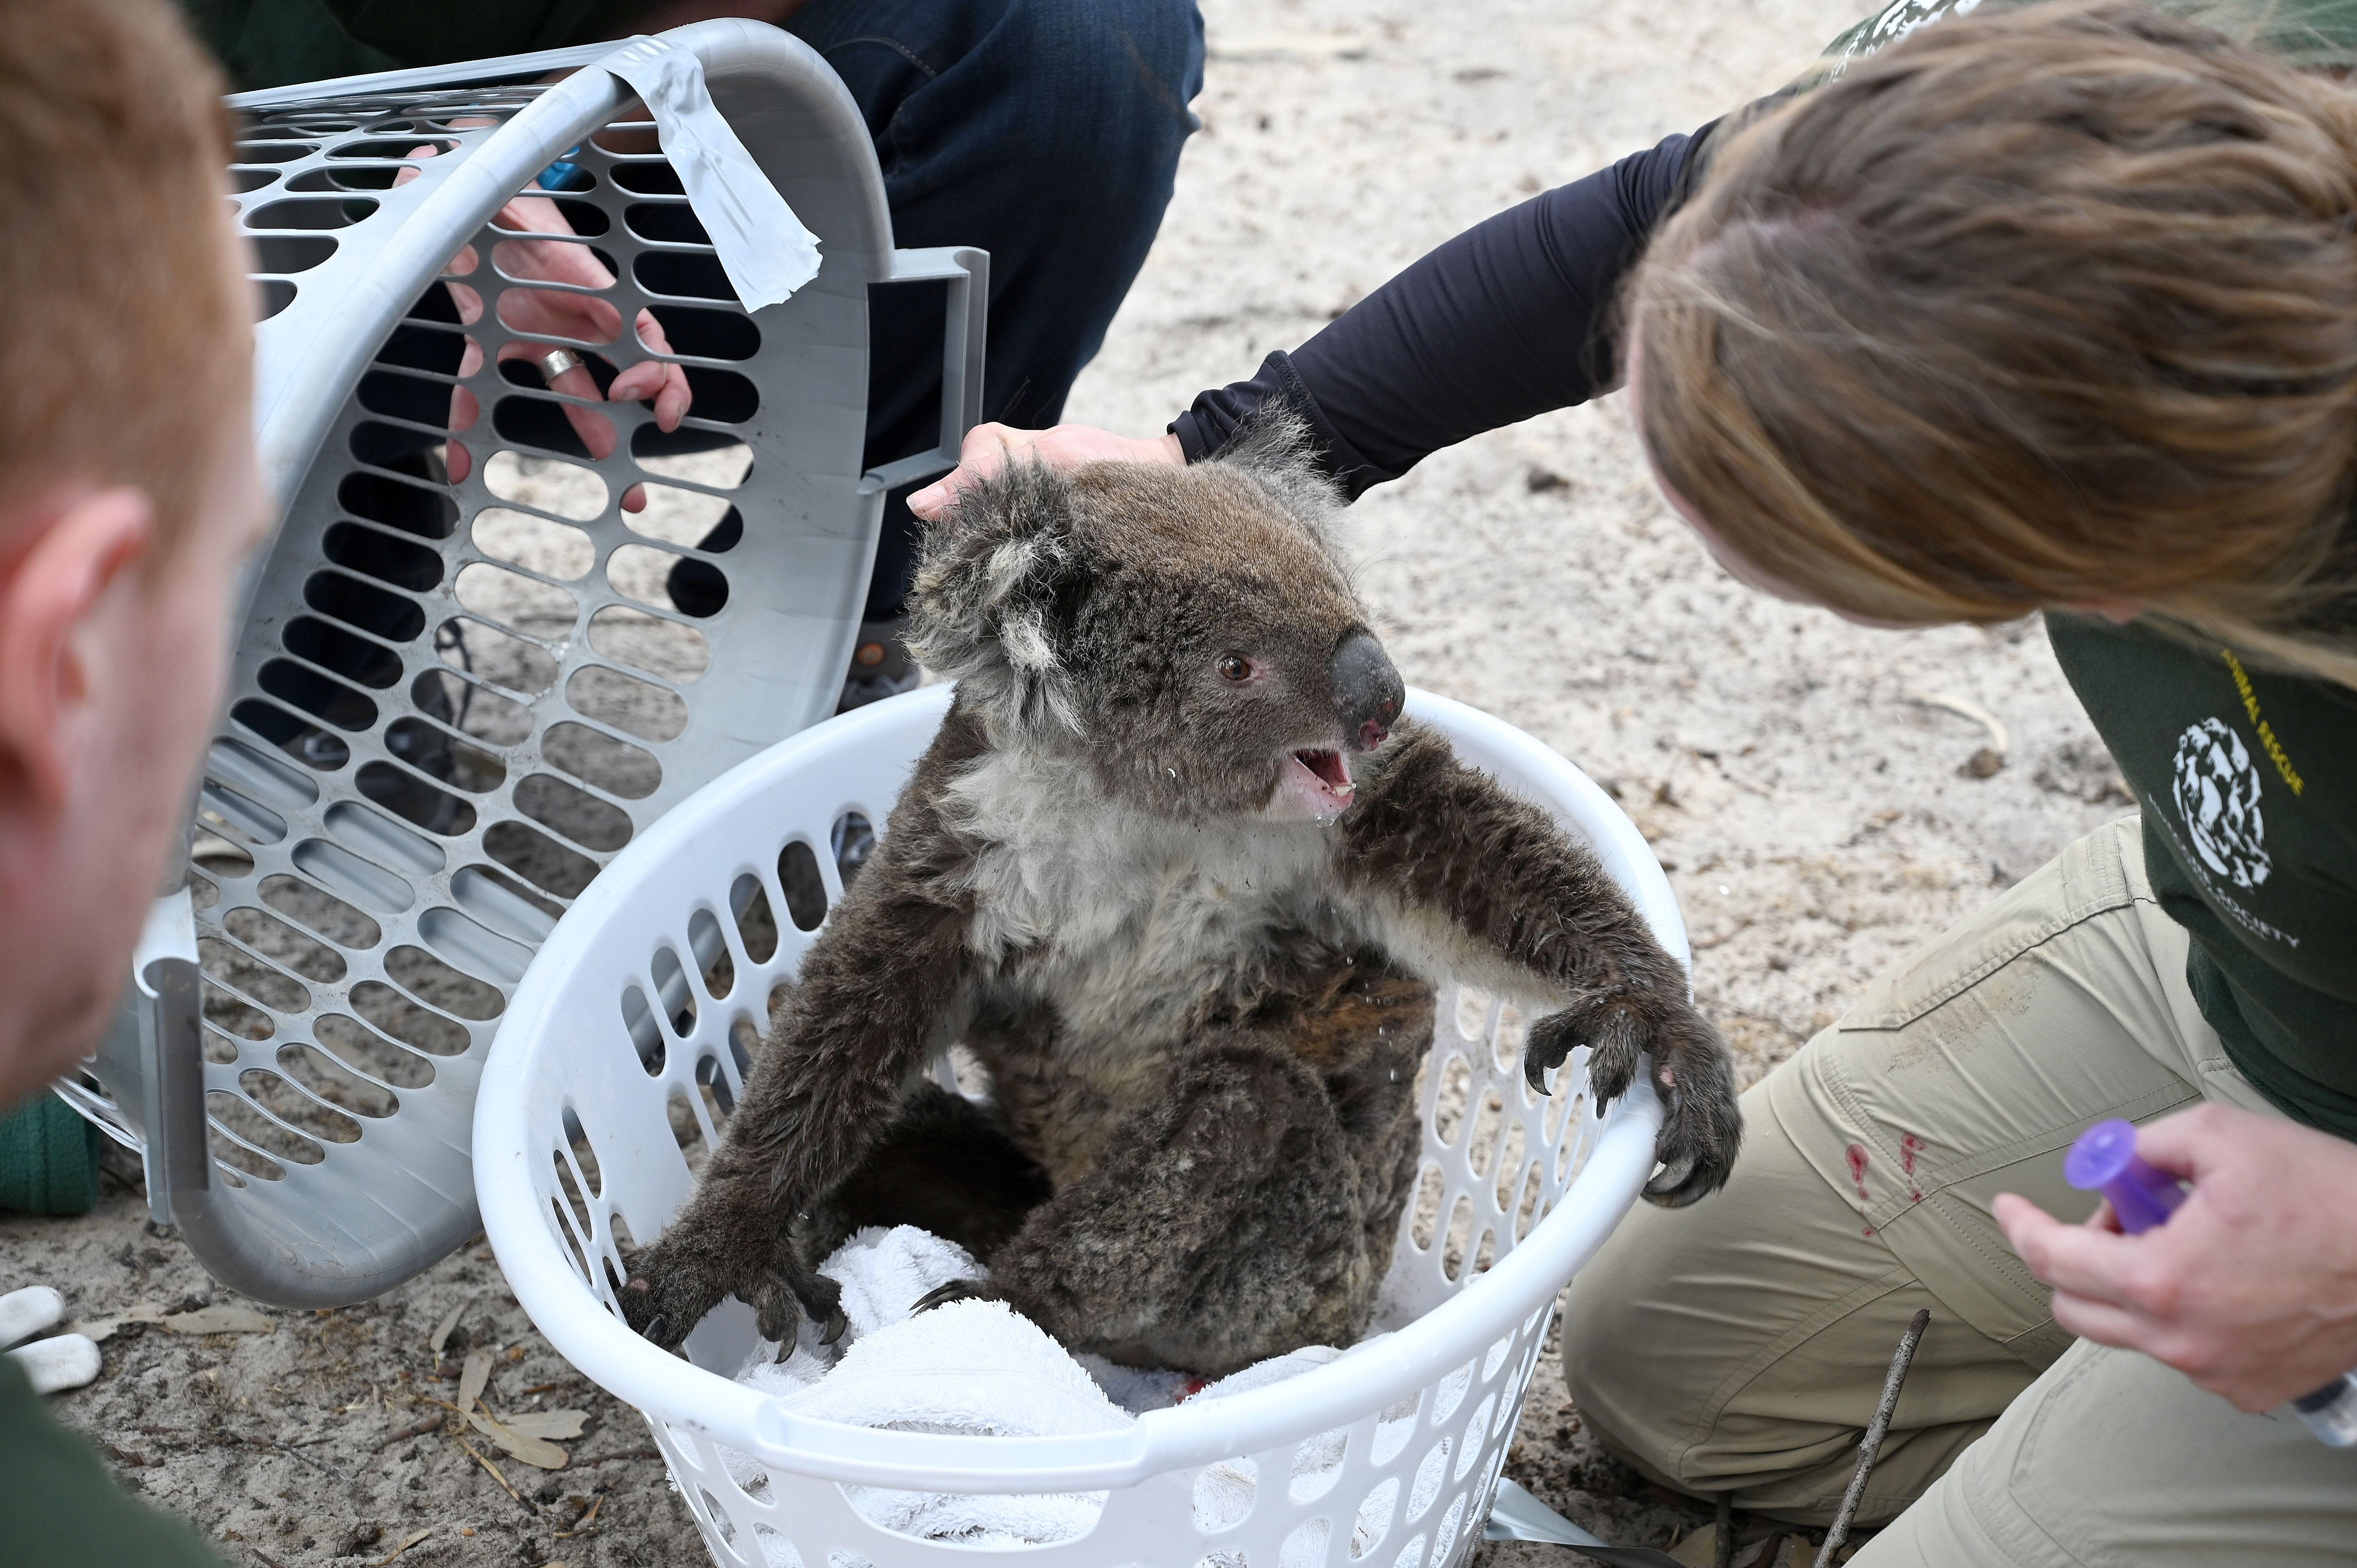 113 animal species need urgent help after Australia's bushfires - Axios